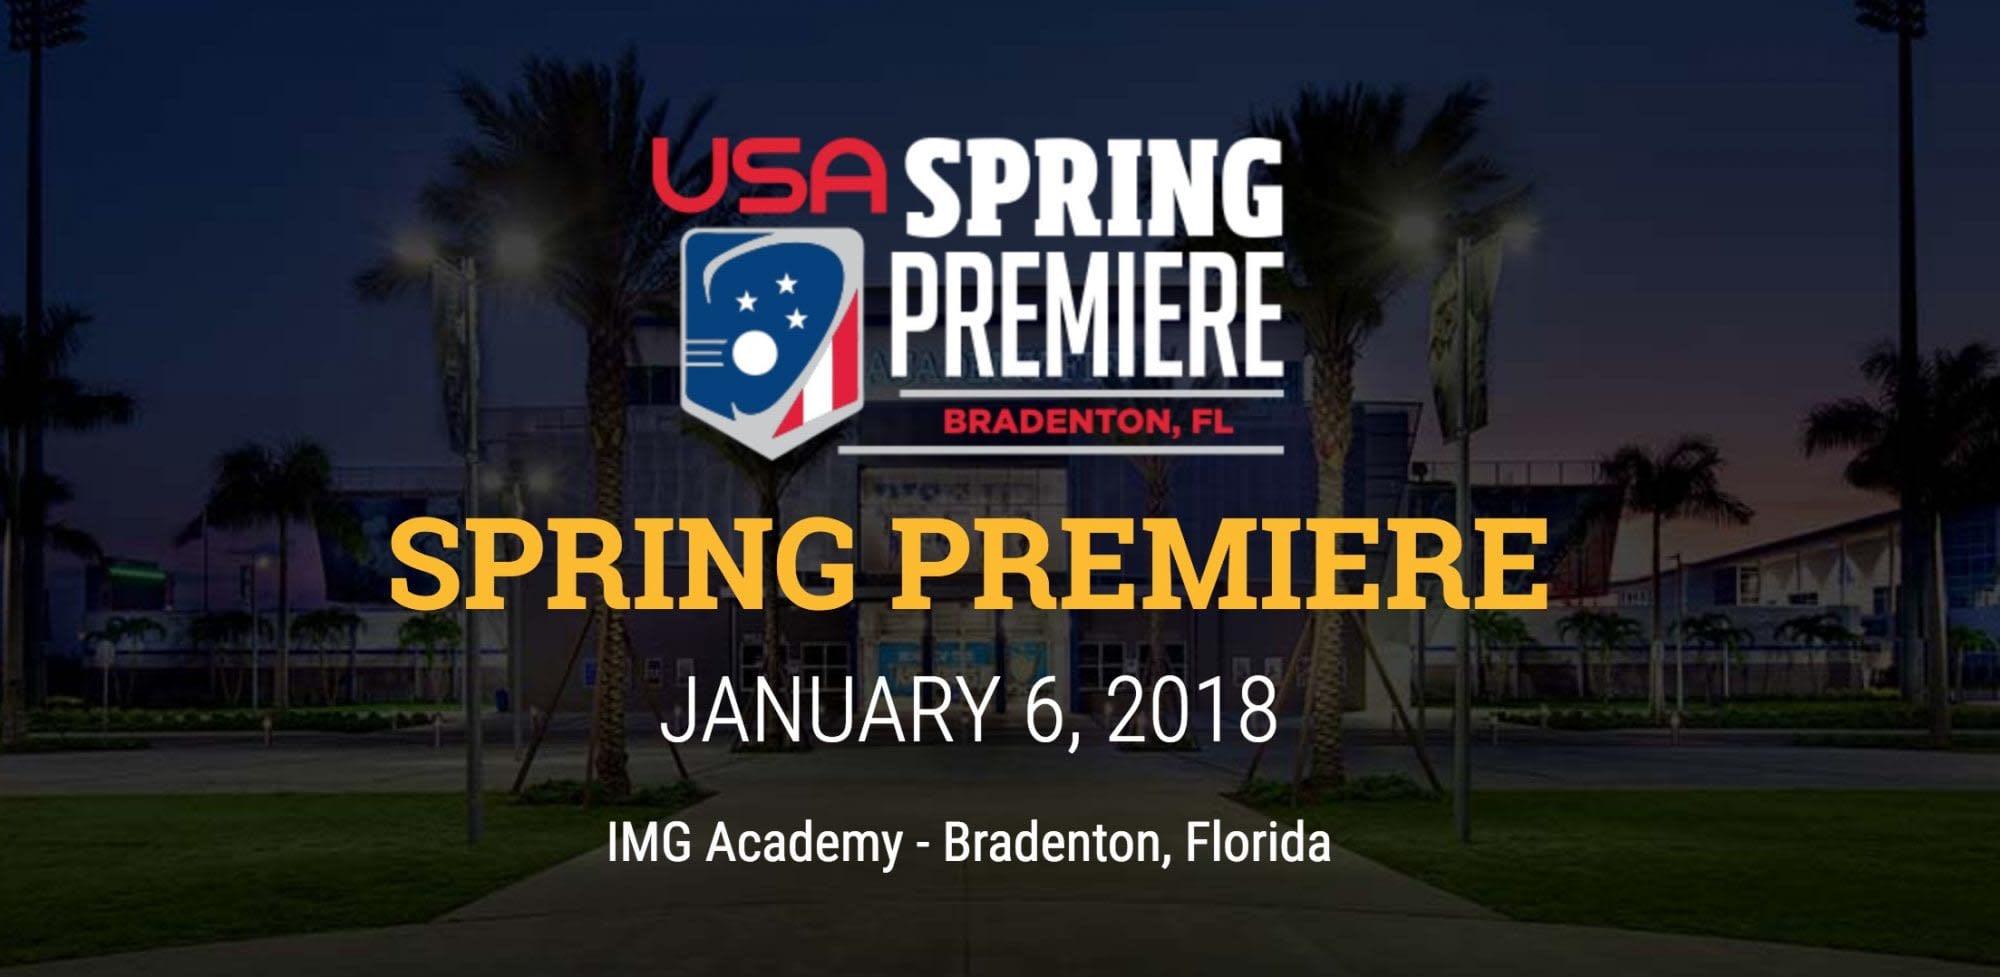 USA Spring Premiere 2018